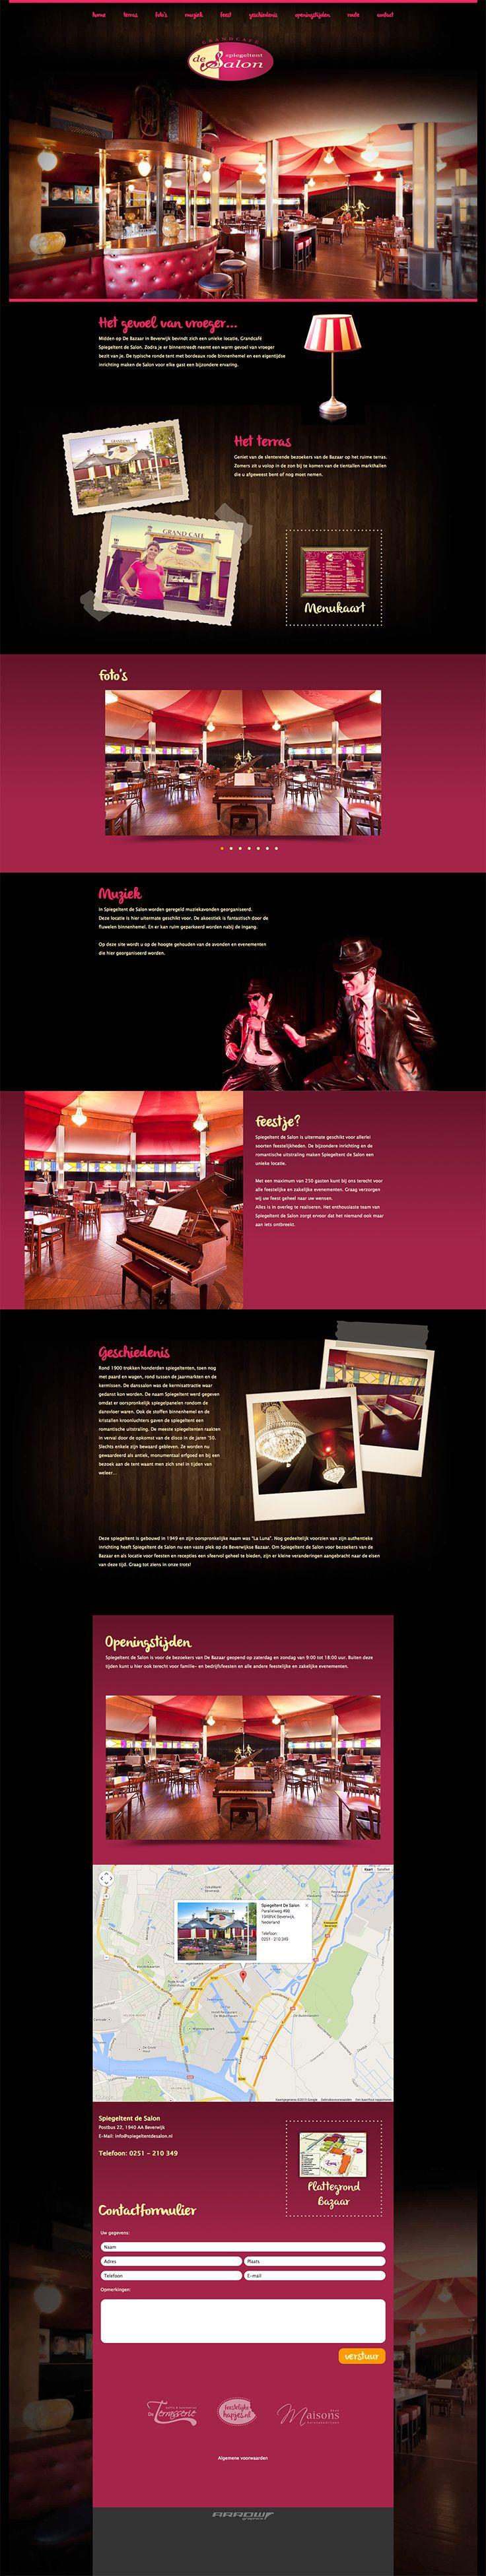 Website design voor Spiegeltent de Salon